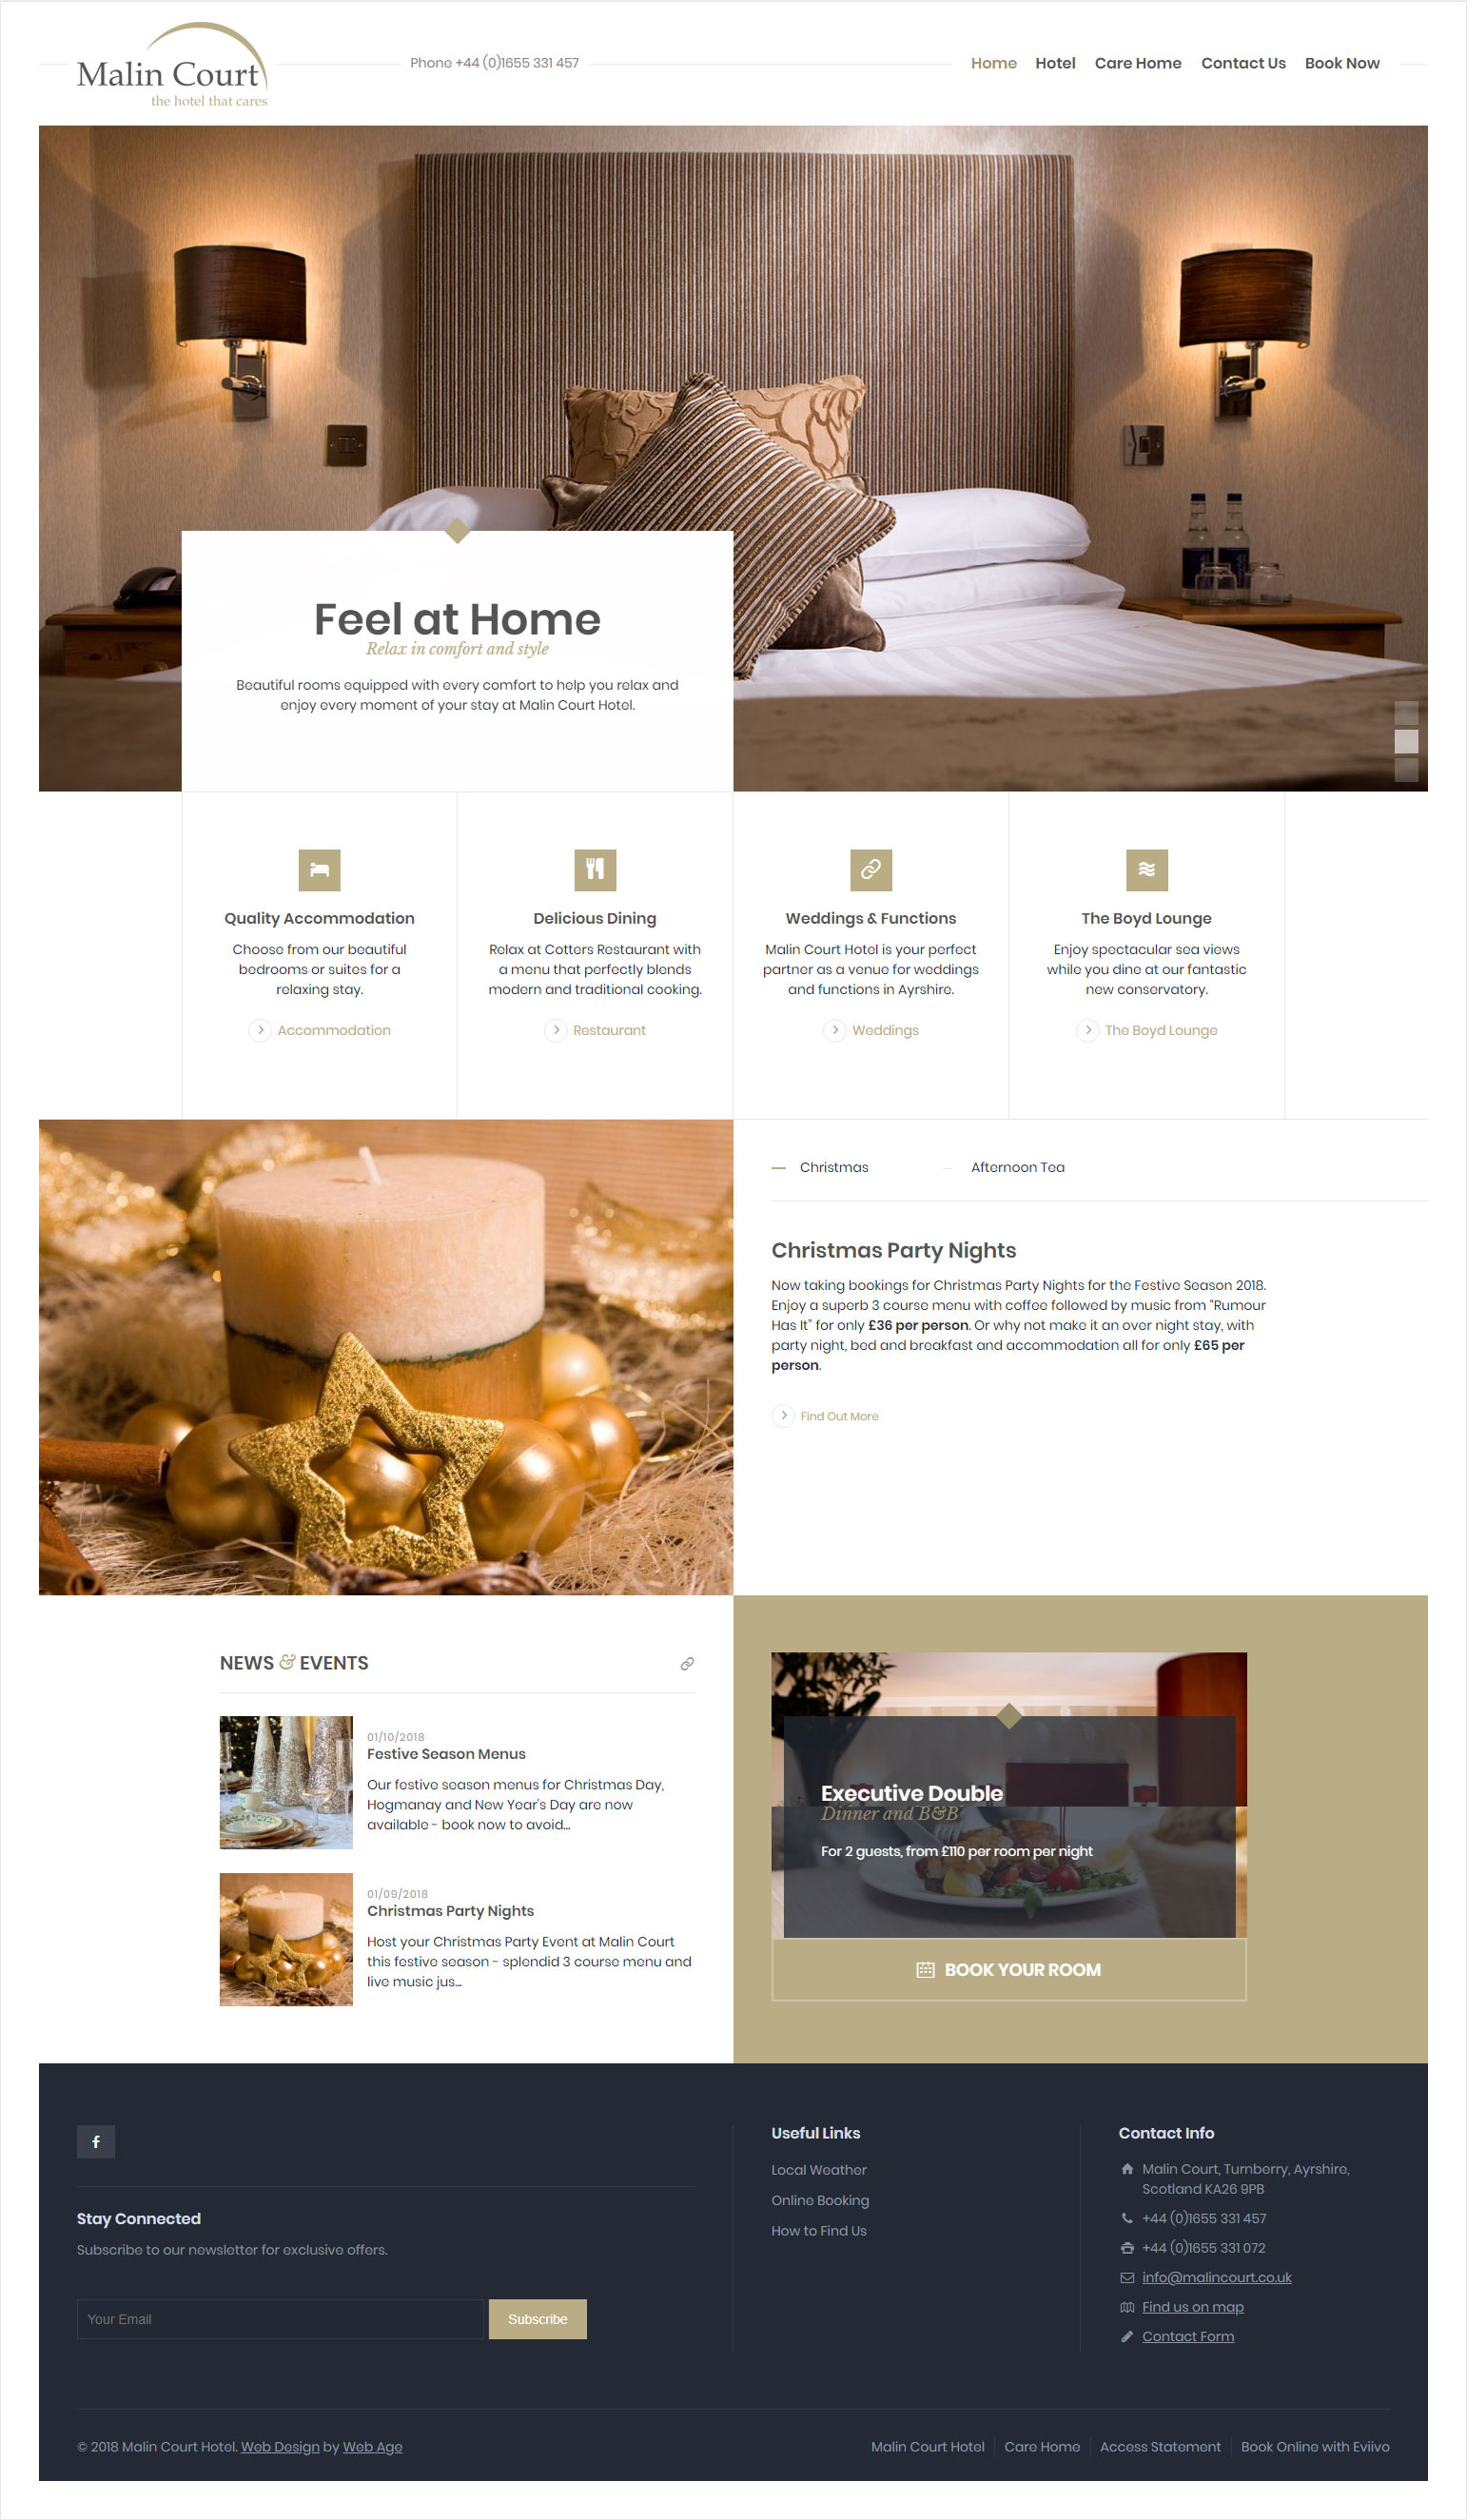 Malin Court Hotel - web design for hotel